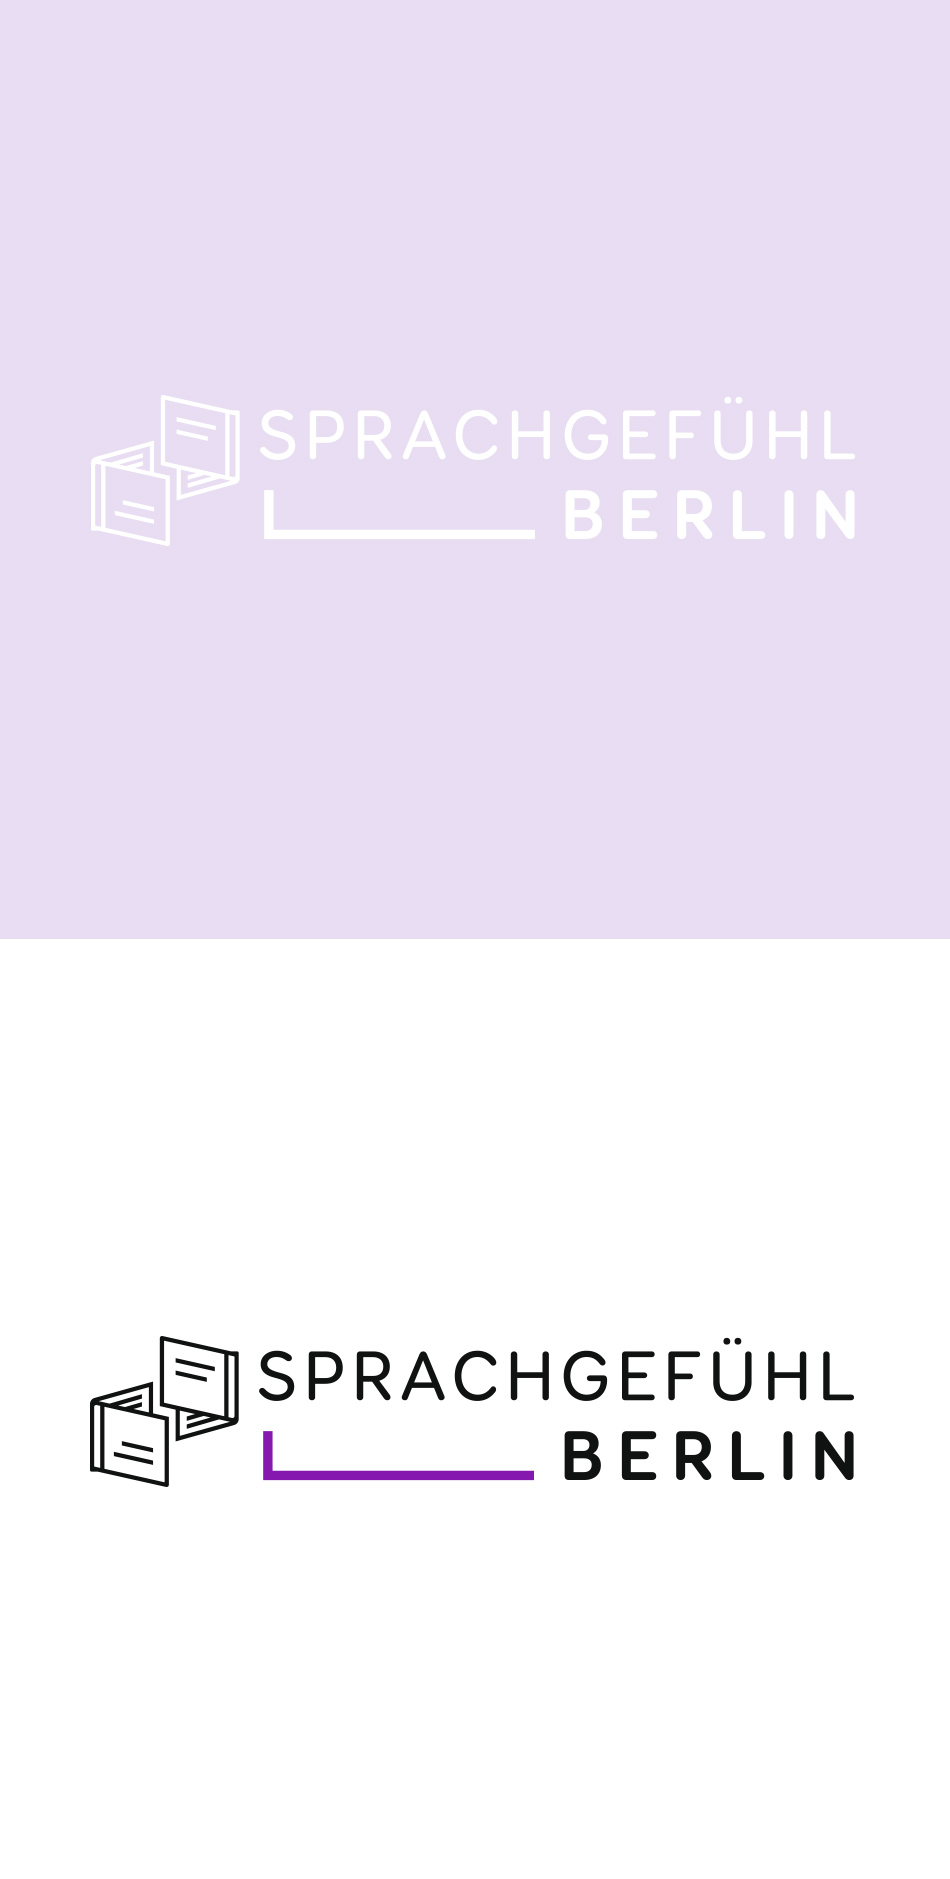 Website Sprachgefuehl Berlin